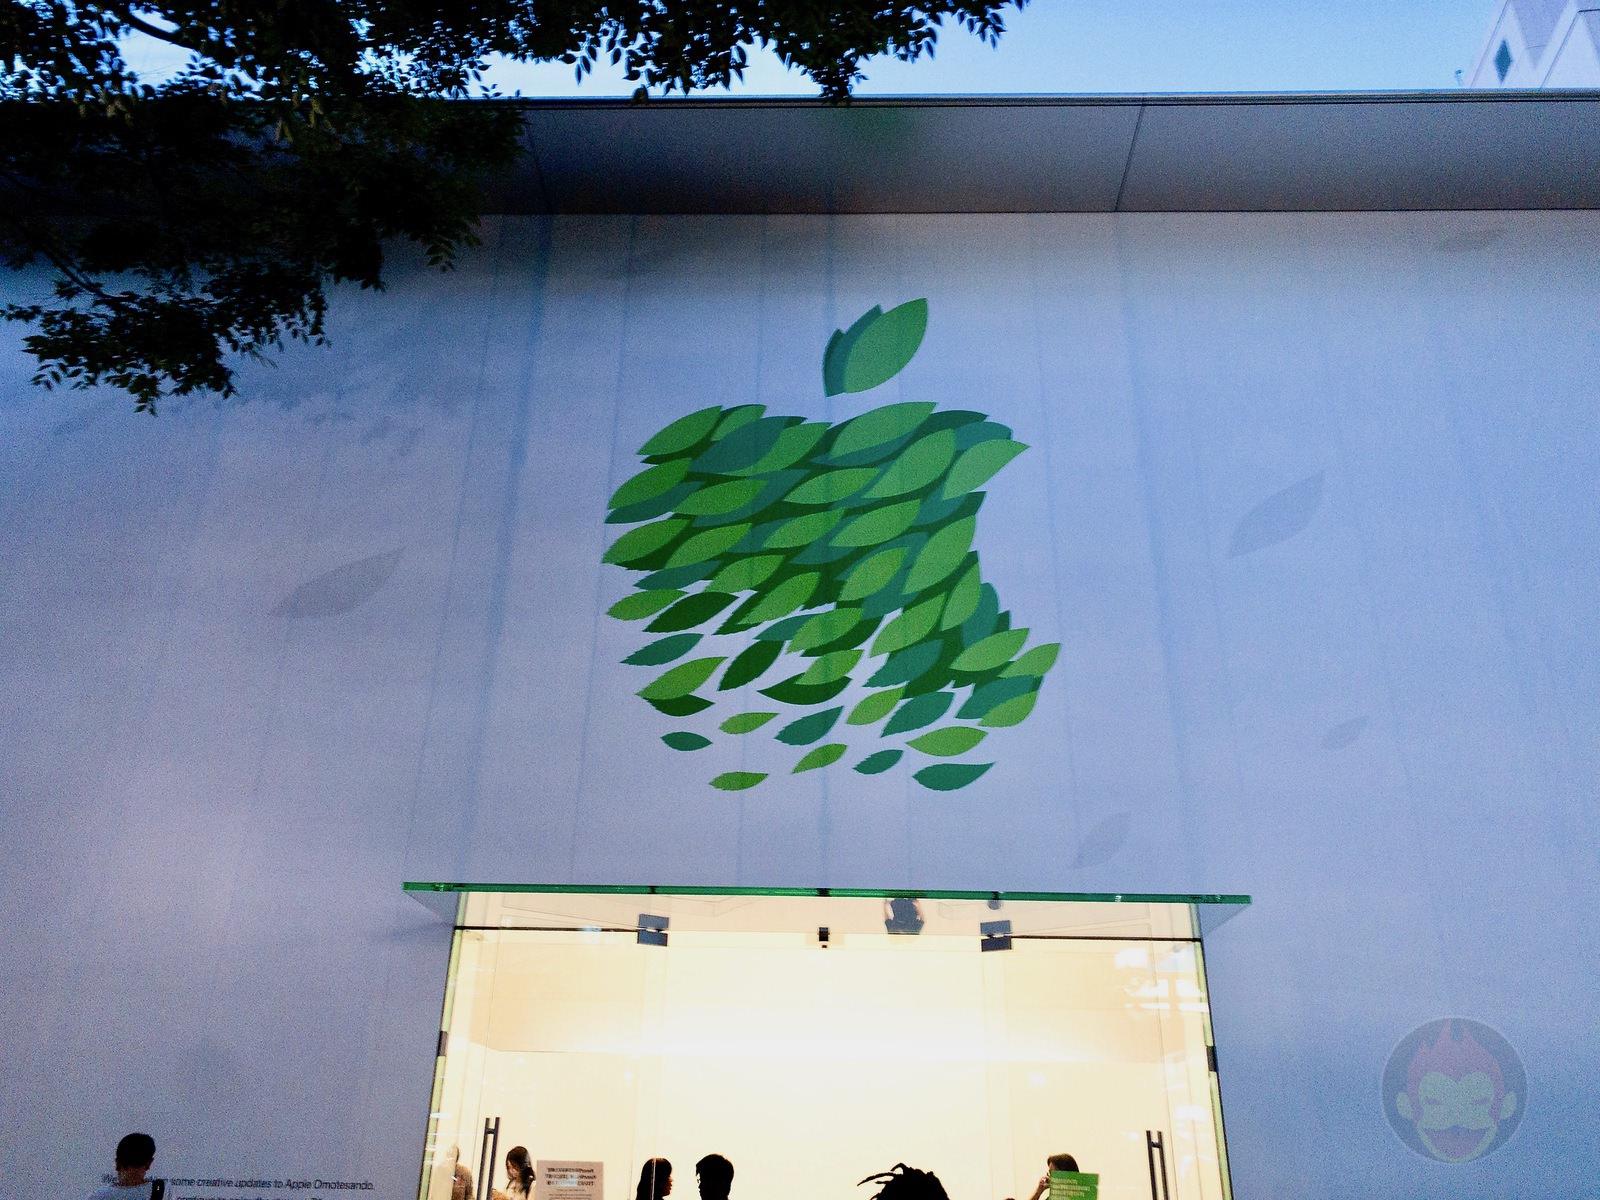 Apple Store Omotesando Basement floor renewal 52